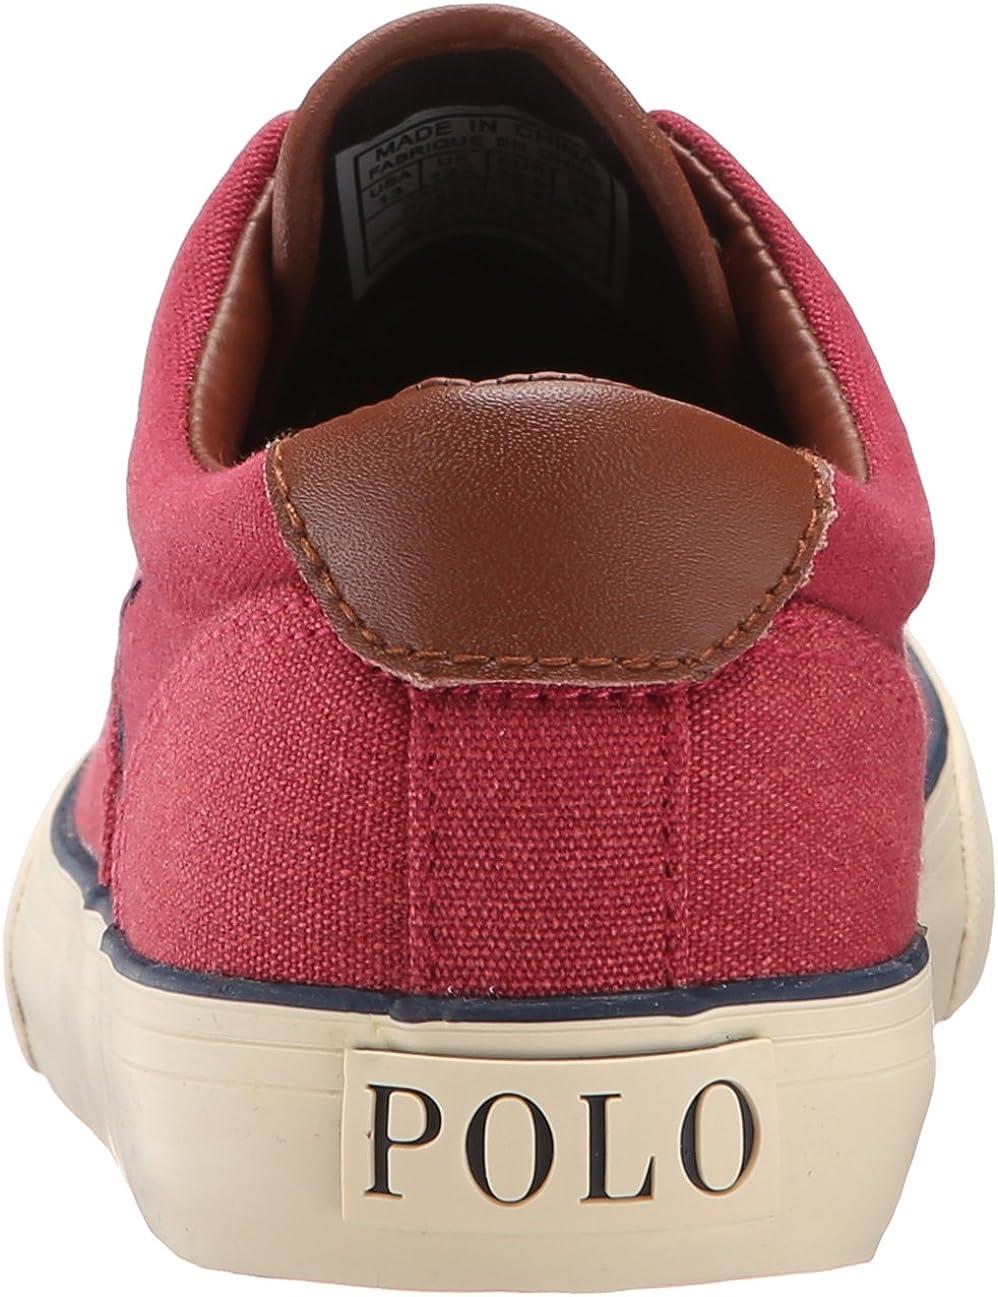 Polo Ralph Lauren Kids Vaughn II Fashion Sneaker